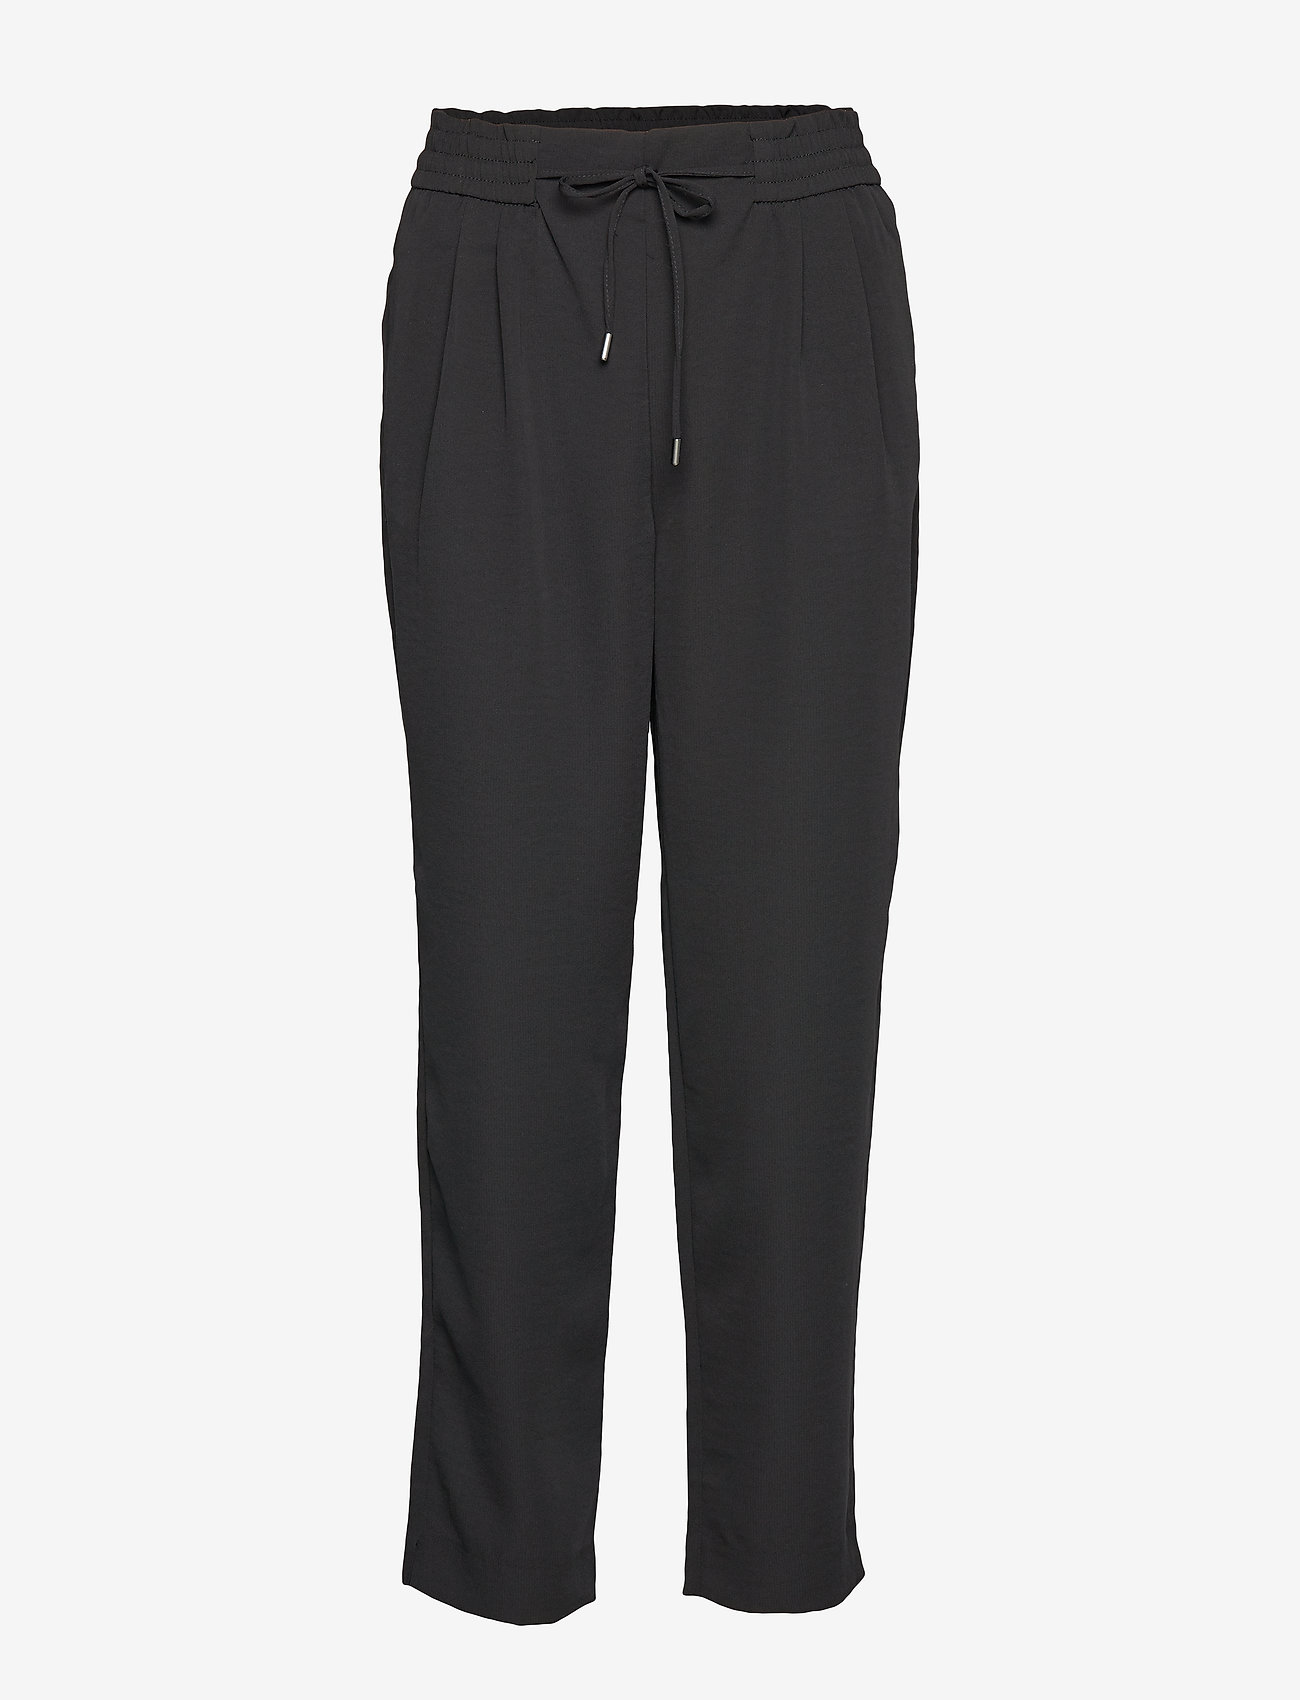 Vila - VIIRIS RWRE 7/8 PANT - NOOS - casual trousers - black - 0